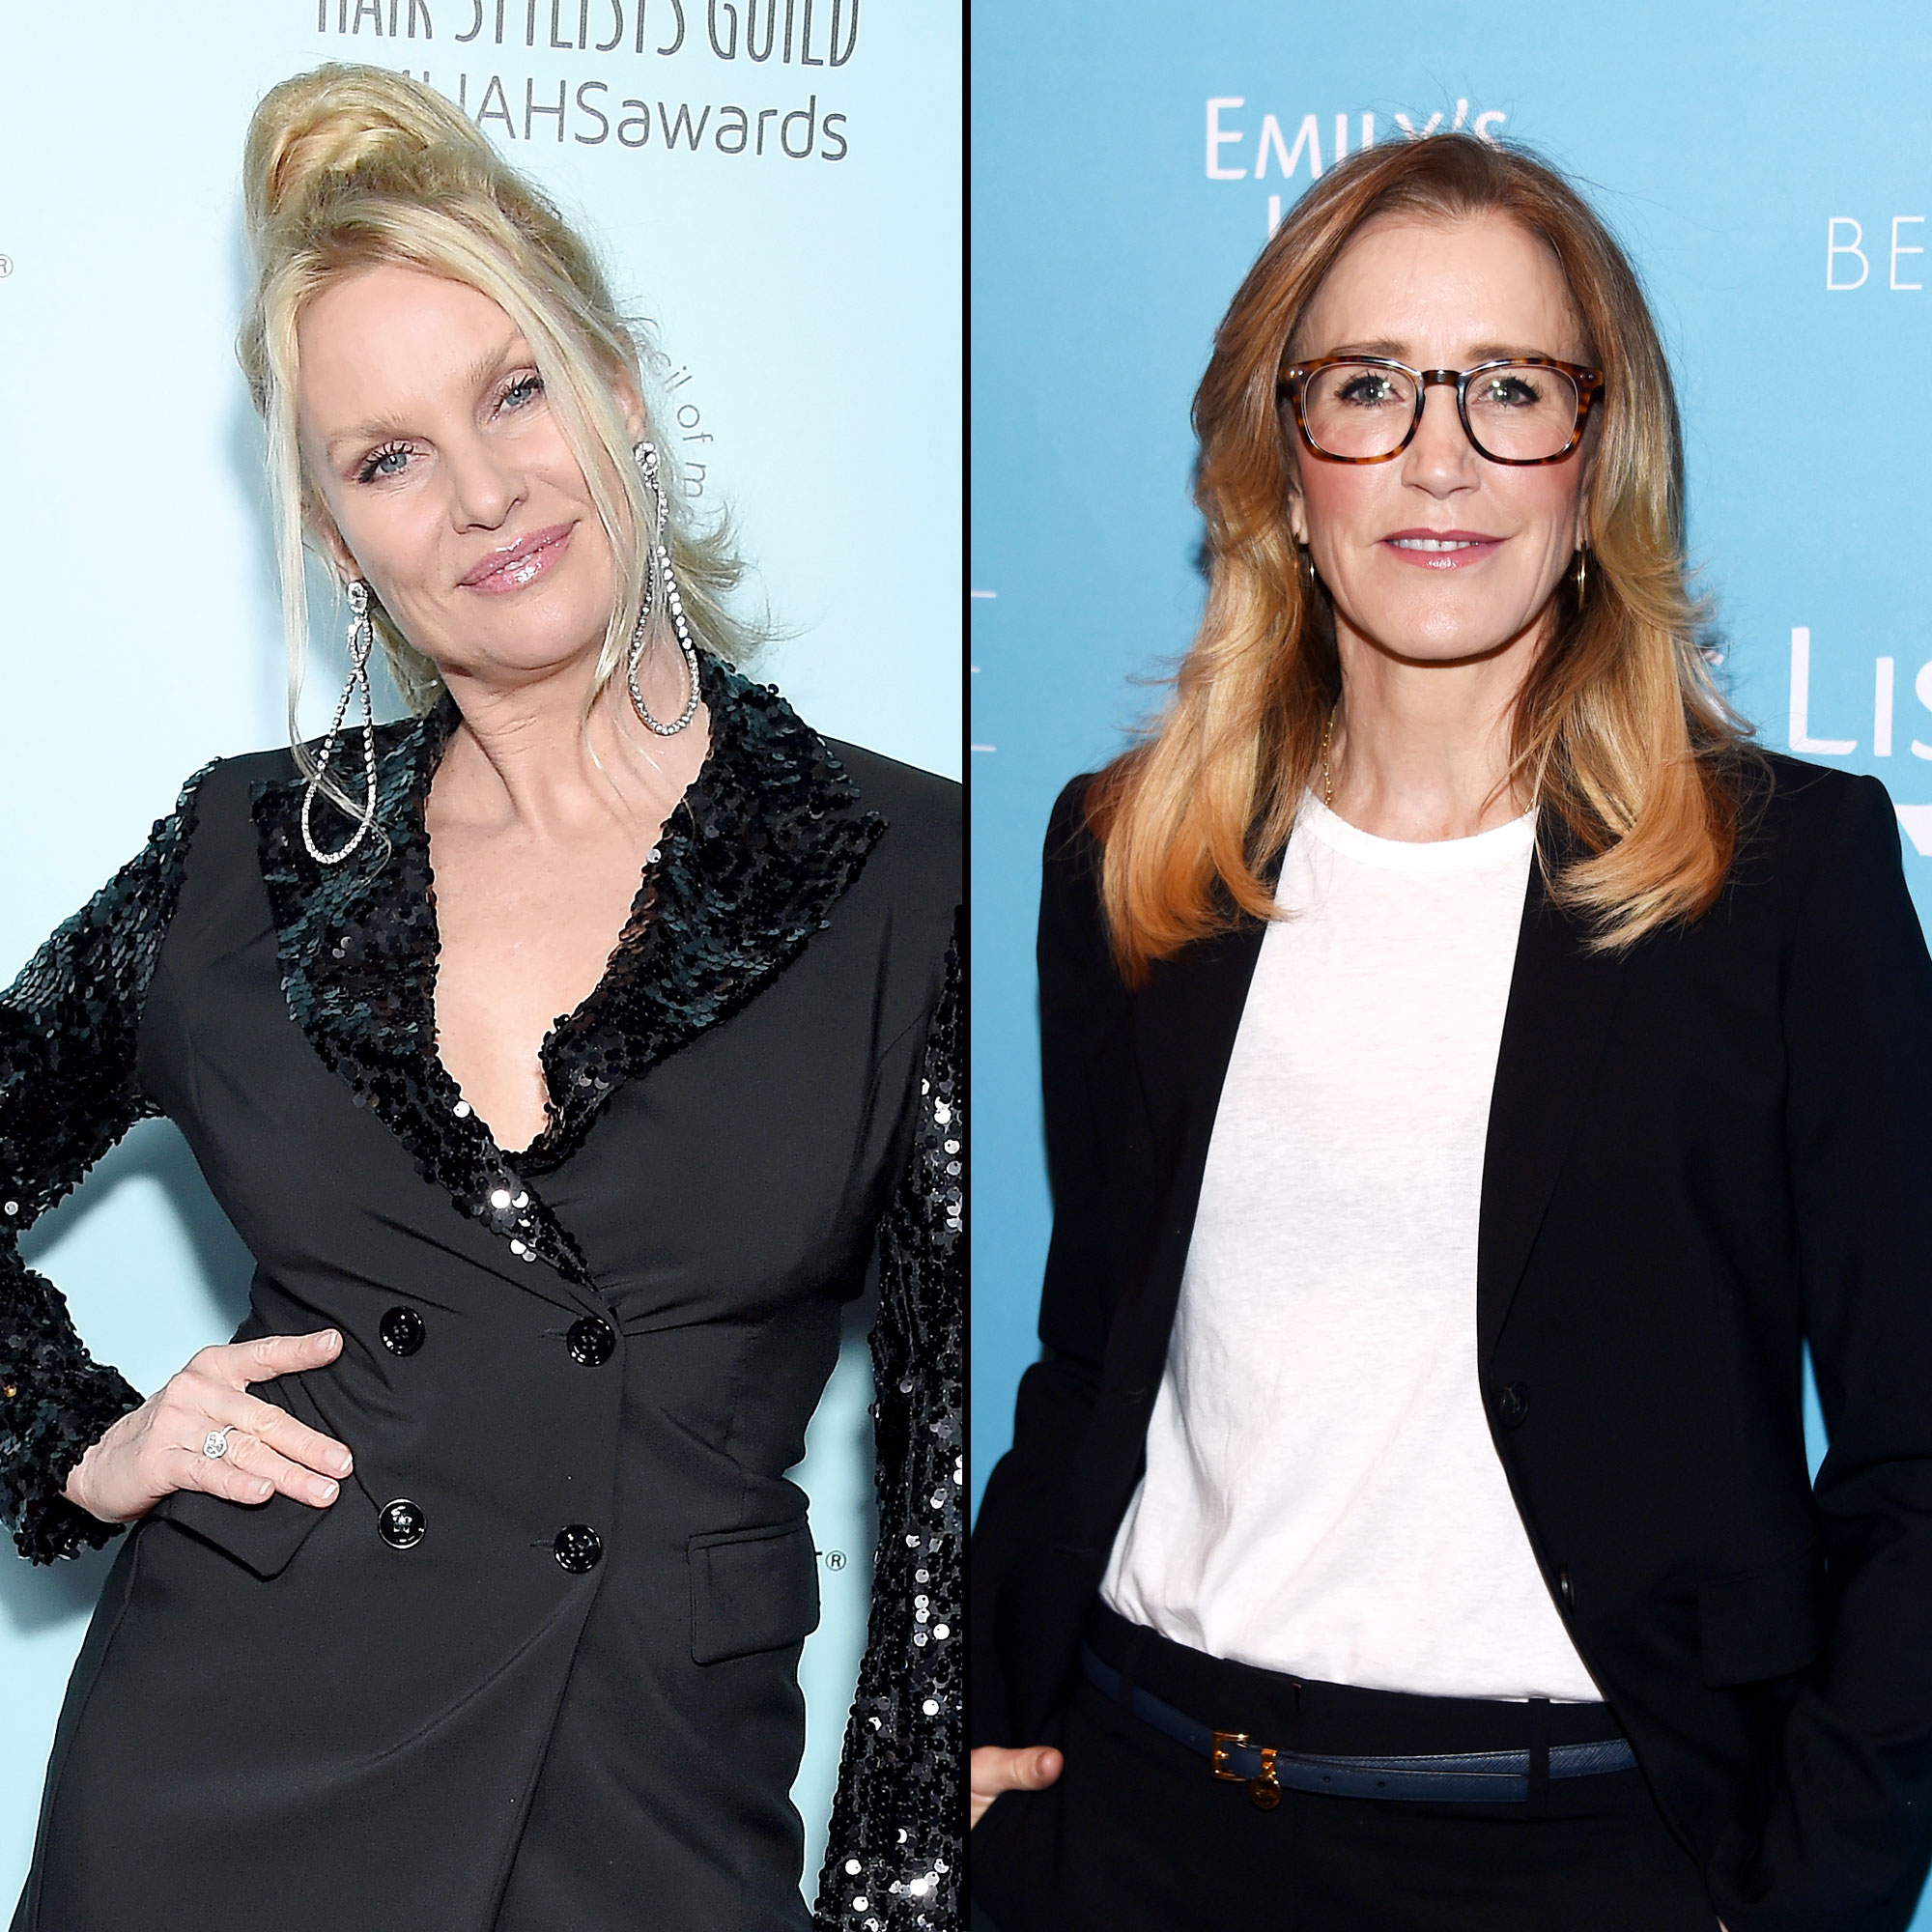 Nicollette Sheridan Slams Former Costar Felicity Huffman's College Scandal - Nicollette Sheridan and Felicity Huffman